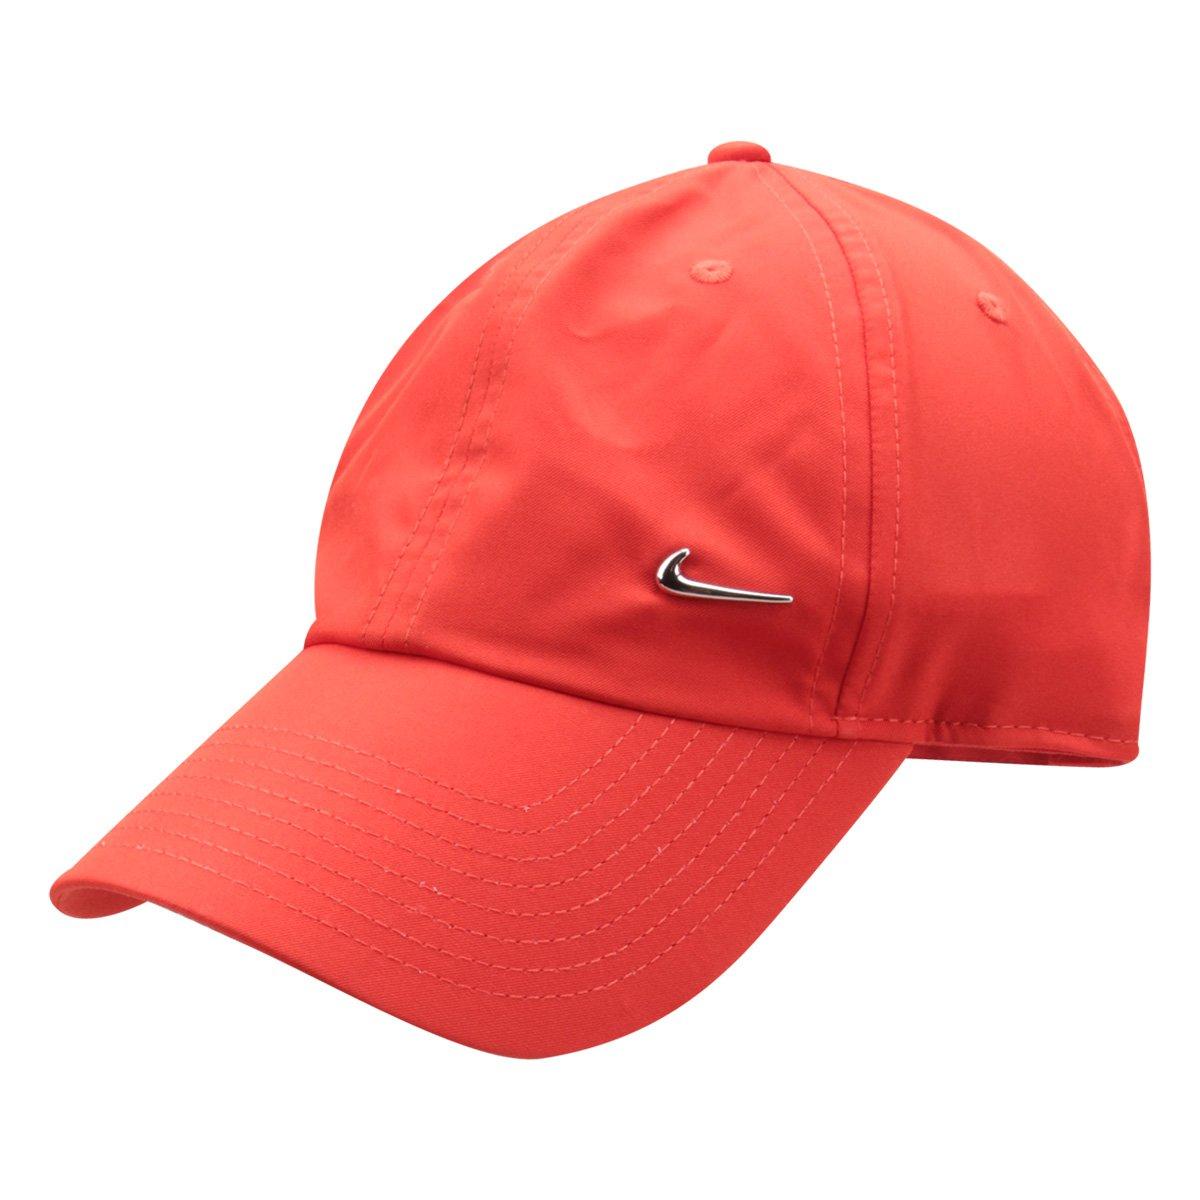 f90744c258e8b Boné Nike Aba Curva H86 Metal Swoosh - Compre Agora